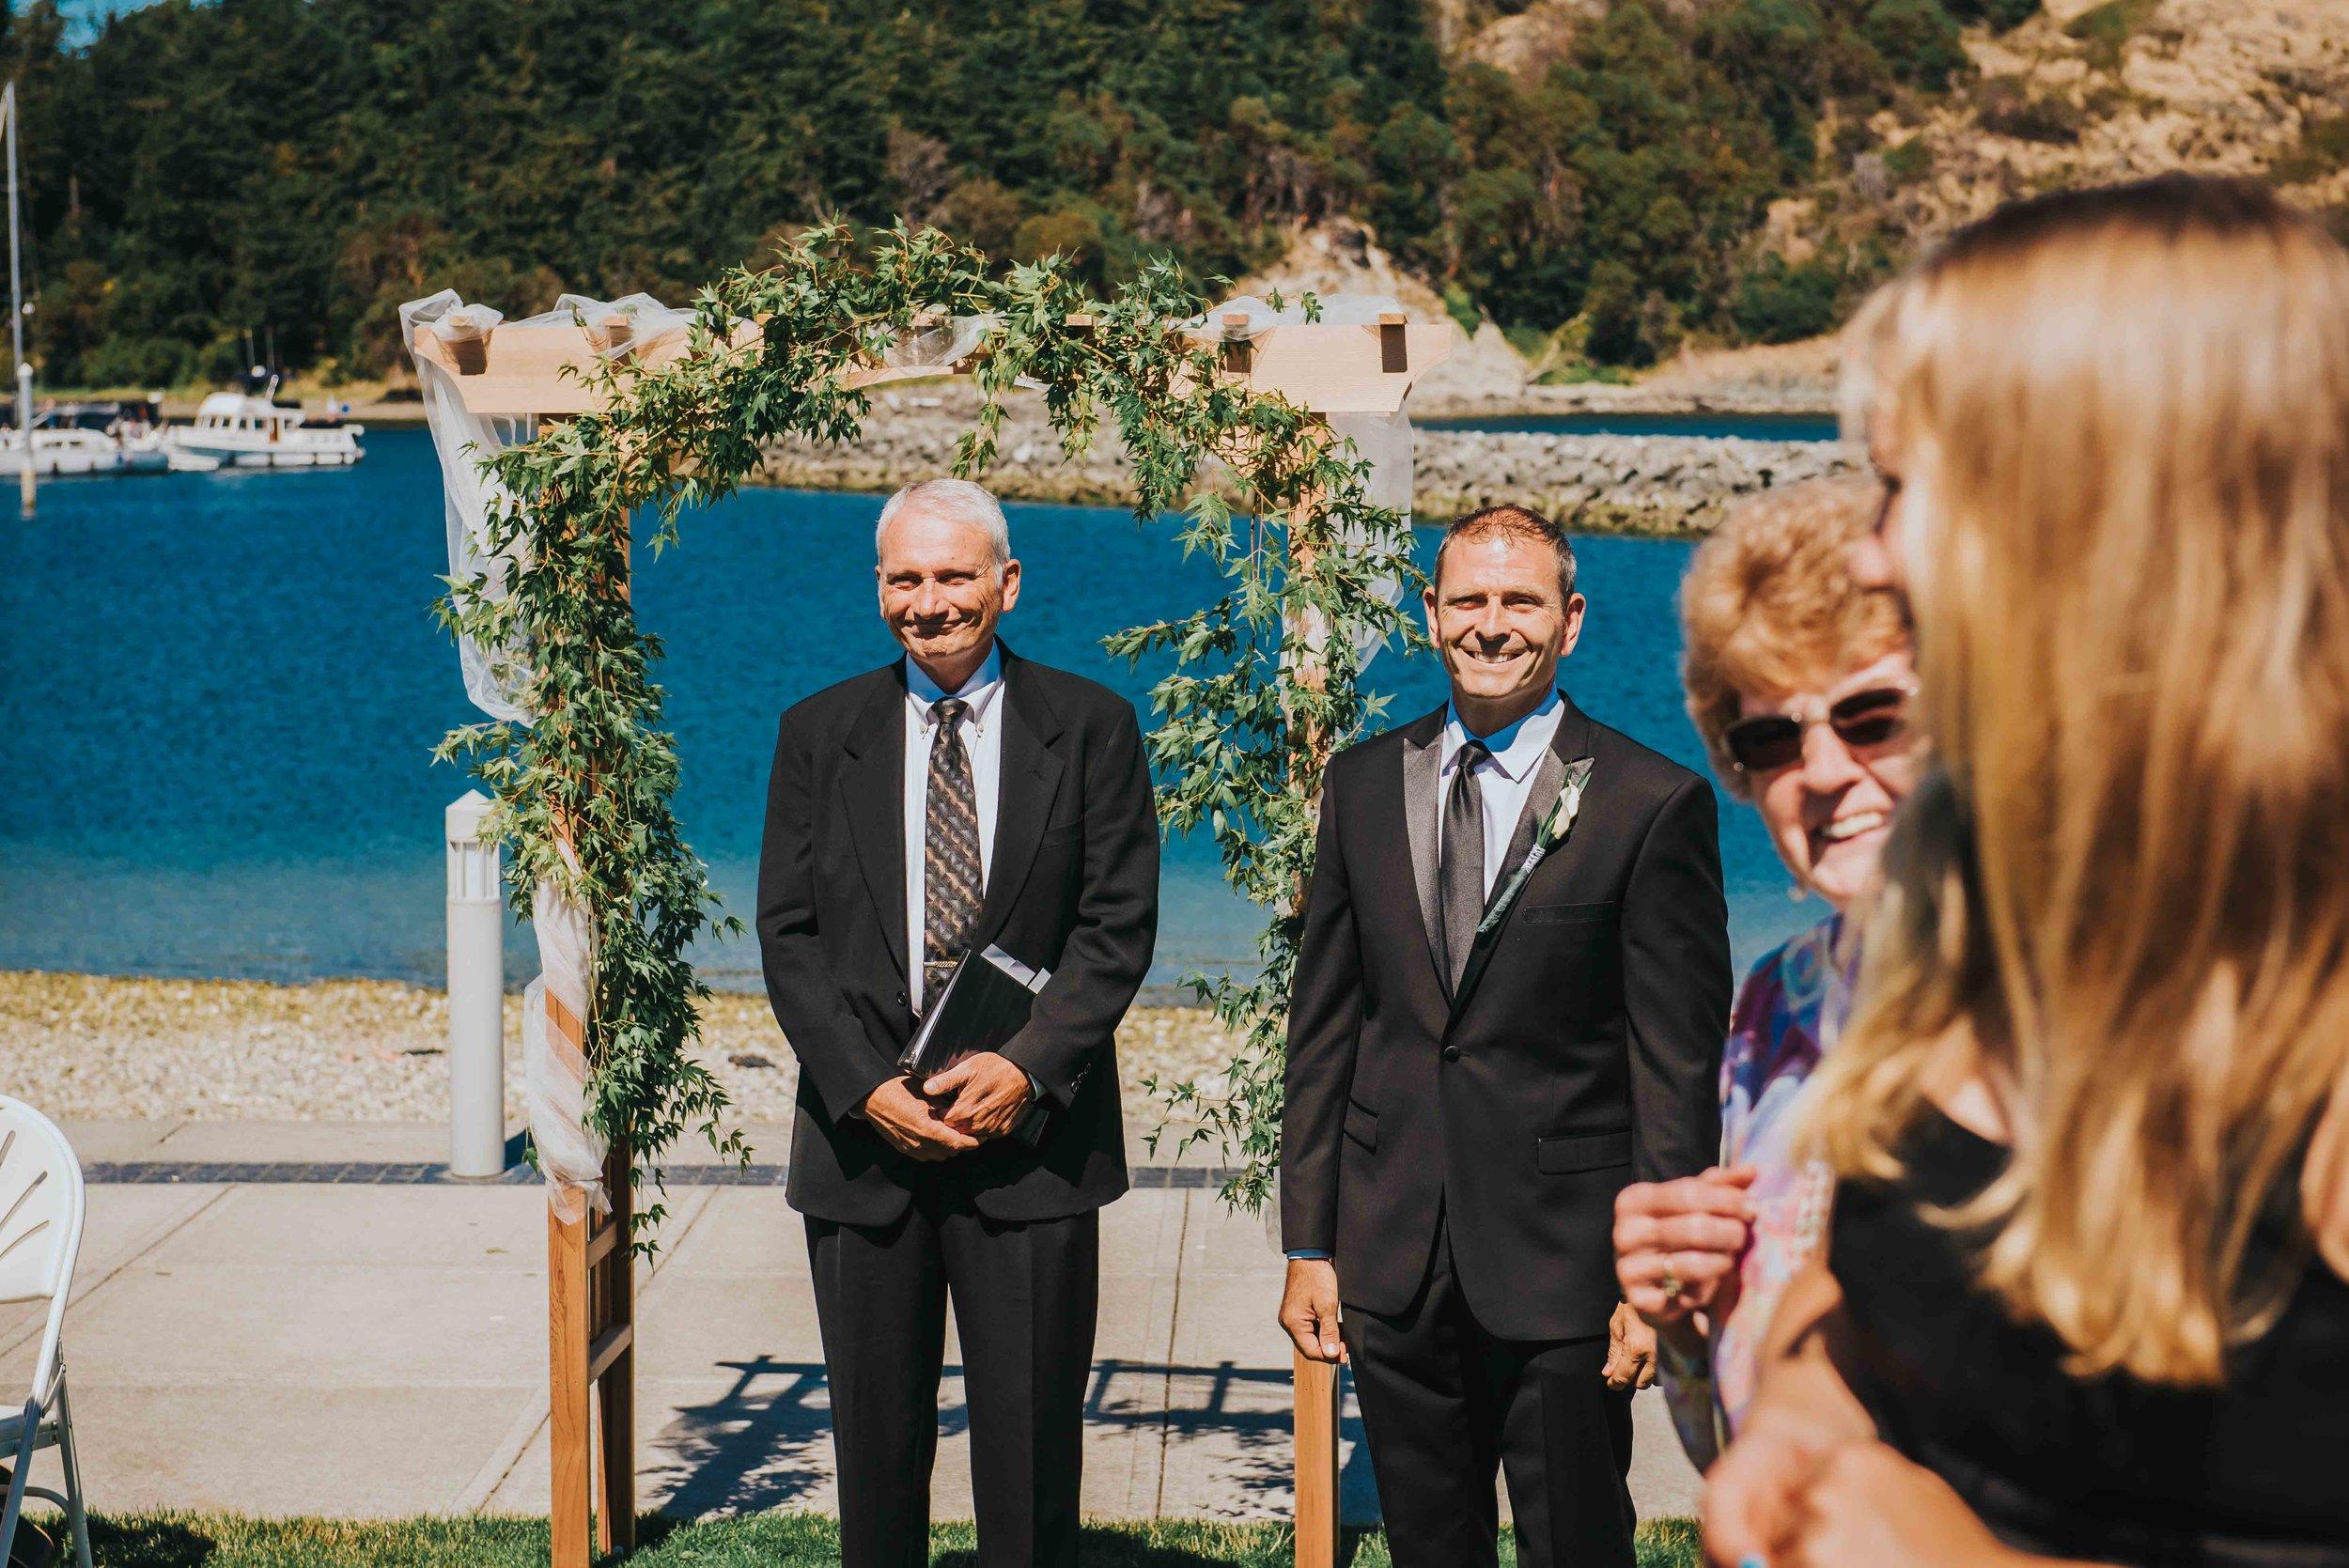 Cap-Sante-Wedding-J-Hodges-Anacortes-28.jpg